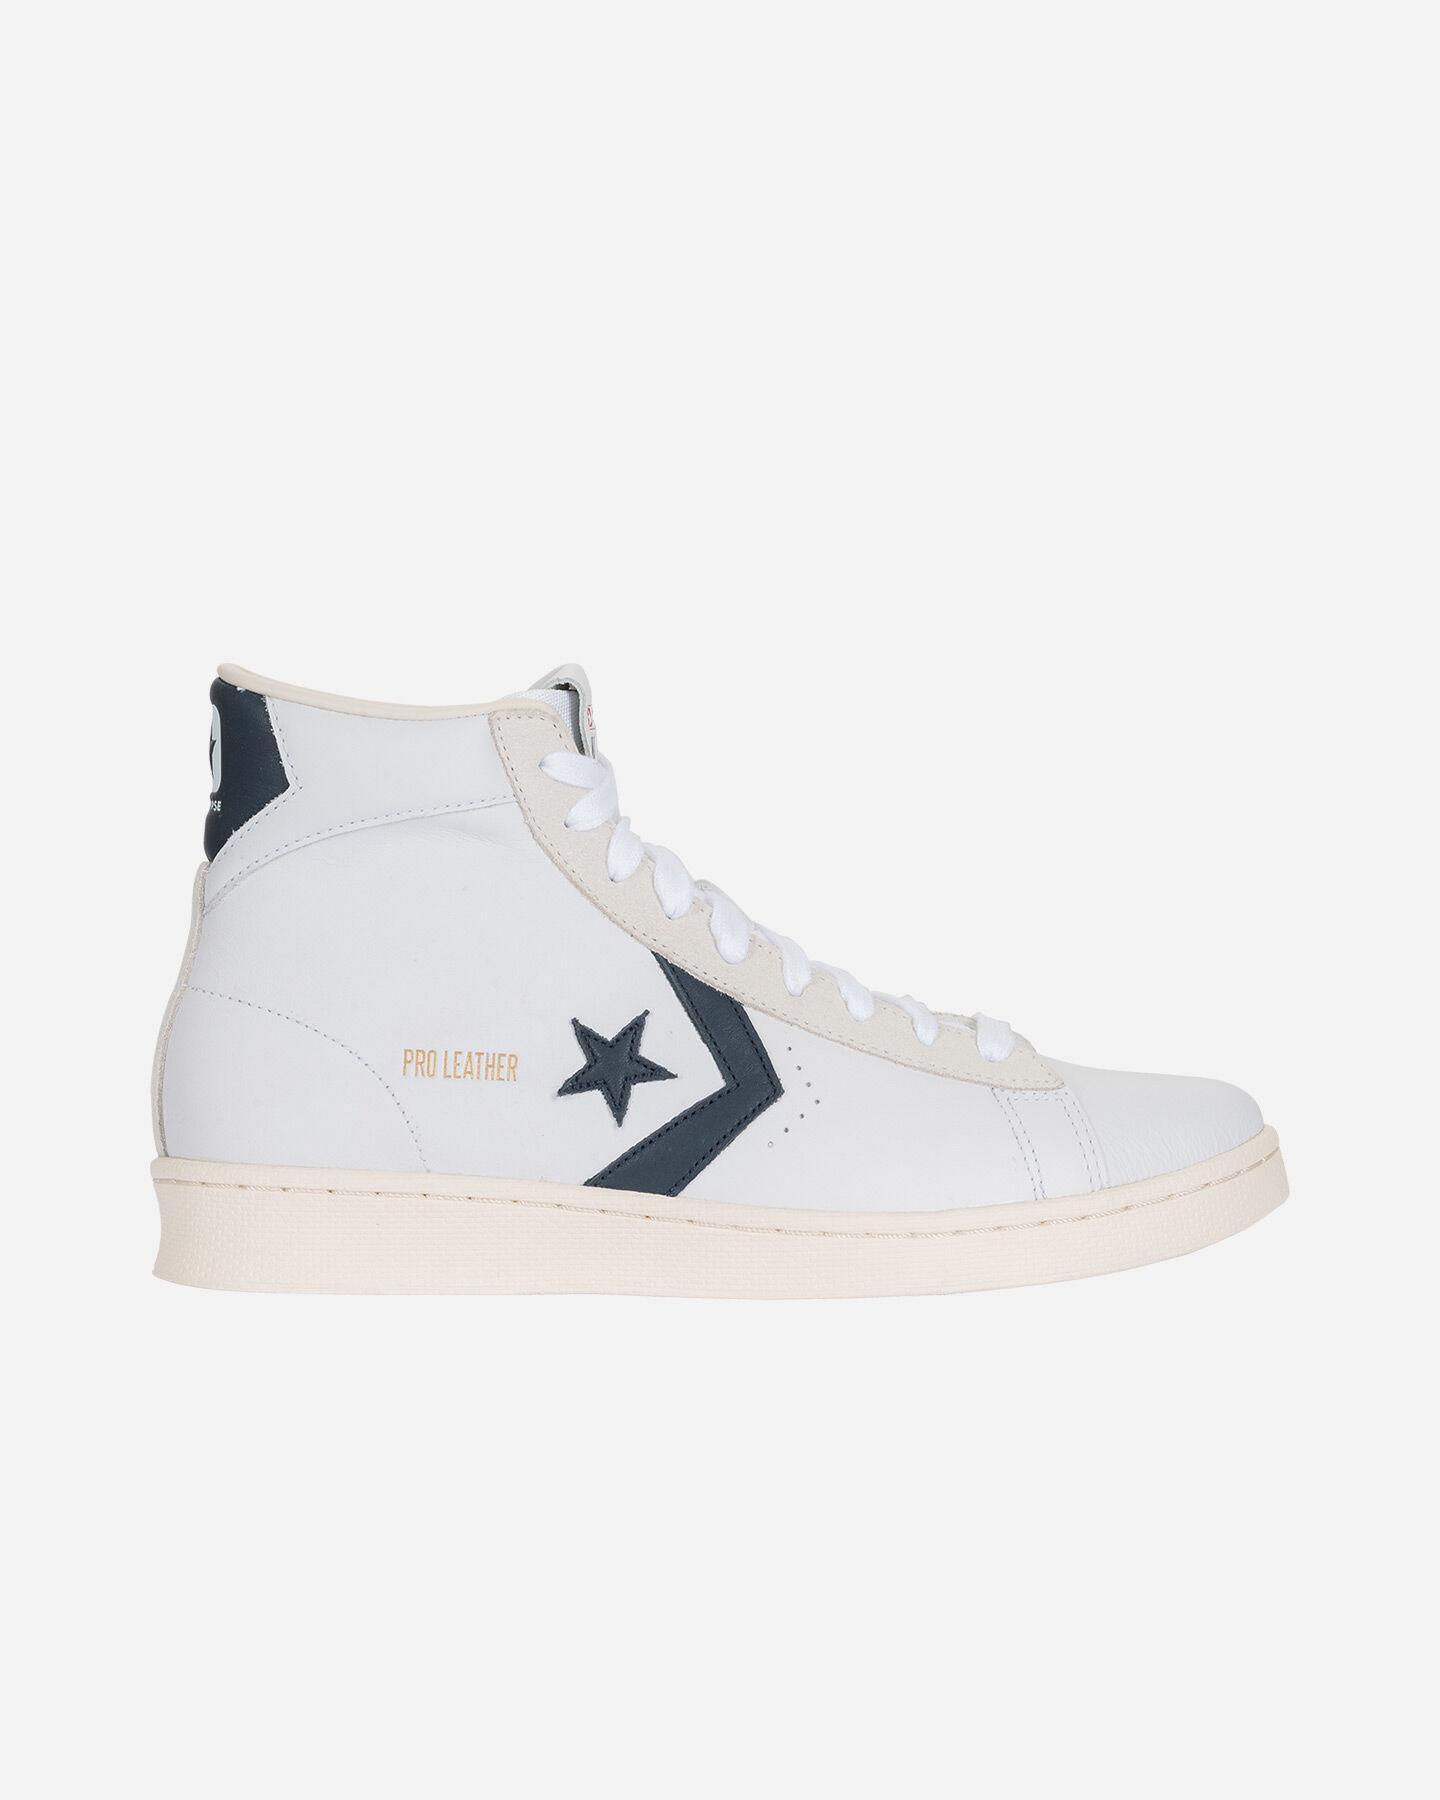 Scarpe sneakers CONVERSE PRO LTH HI OG M S5177311 scatto 0